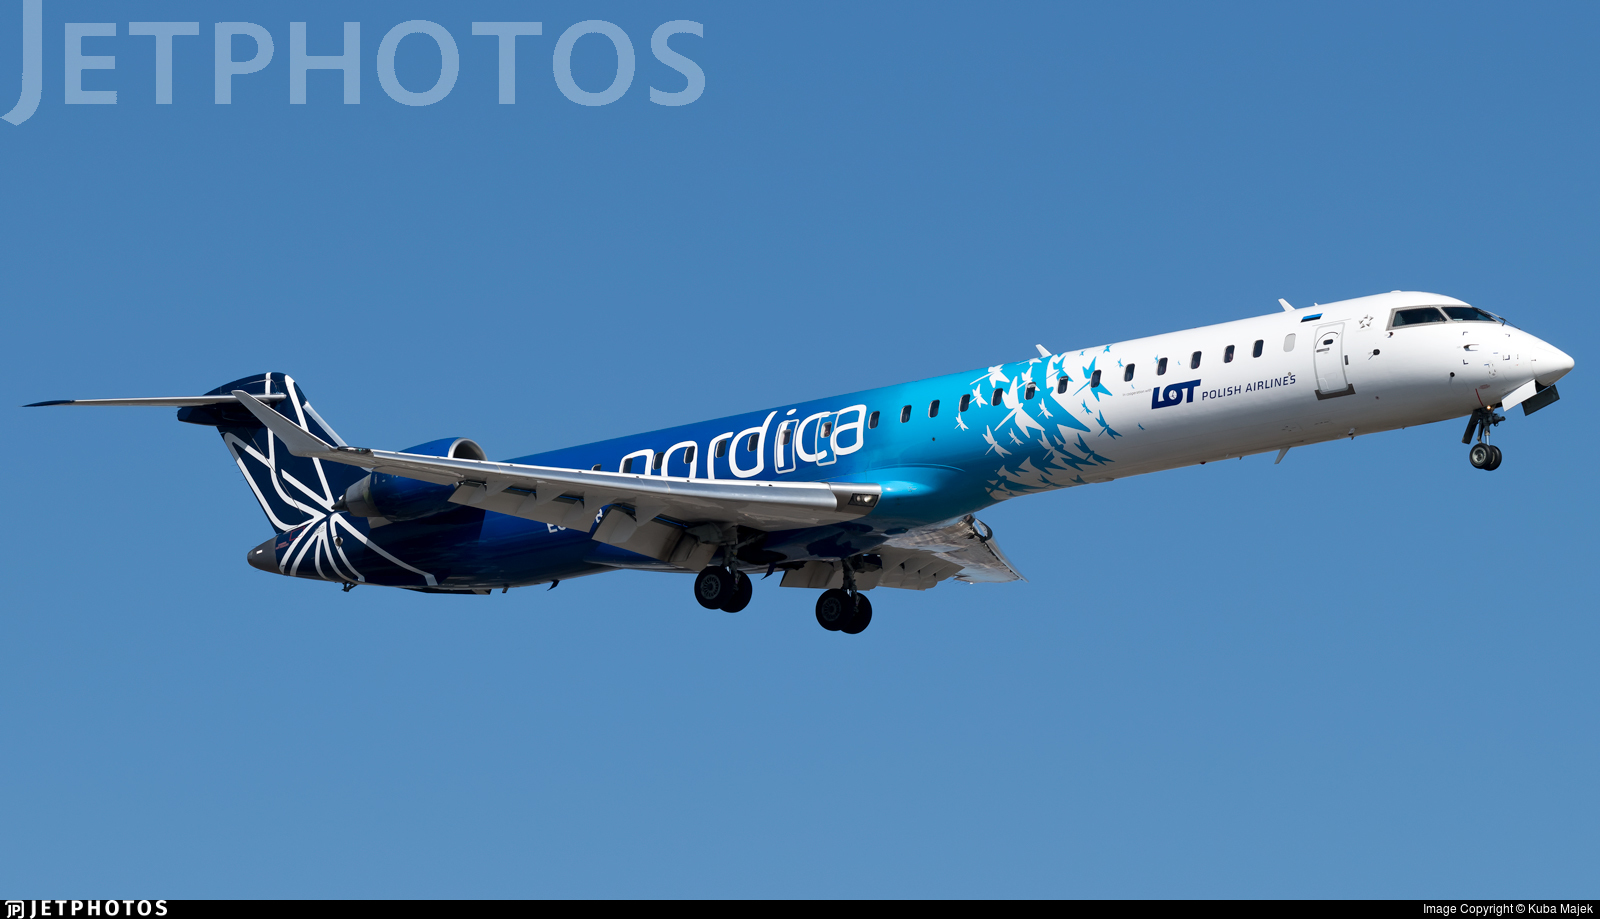 ES-ACB - Bombardier CRJ-900 - LOT Polish Airlines (Nordica)